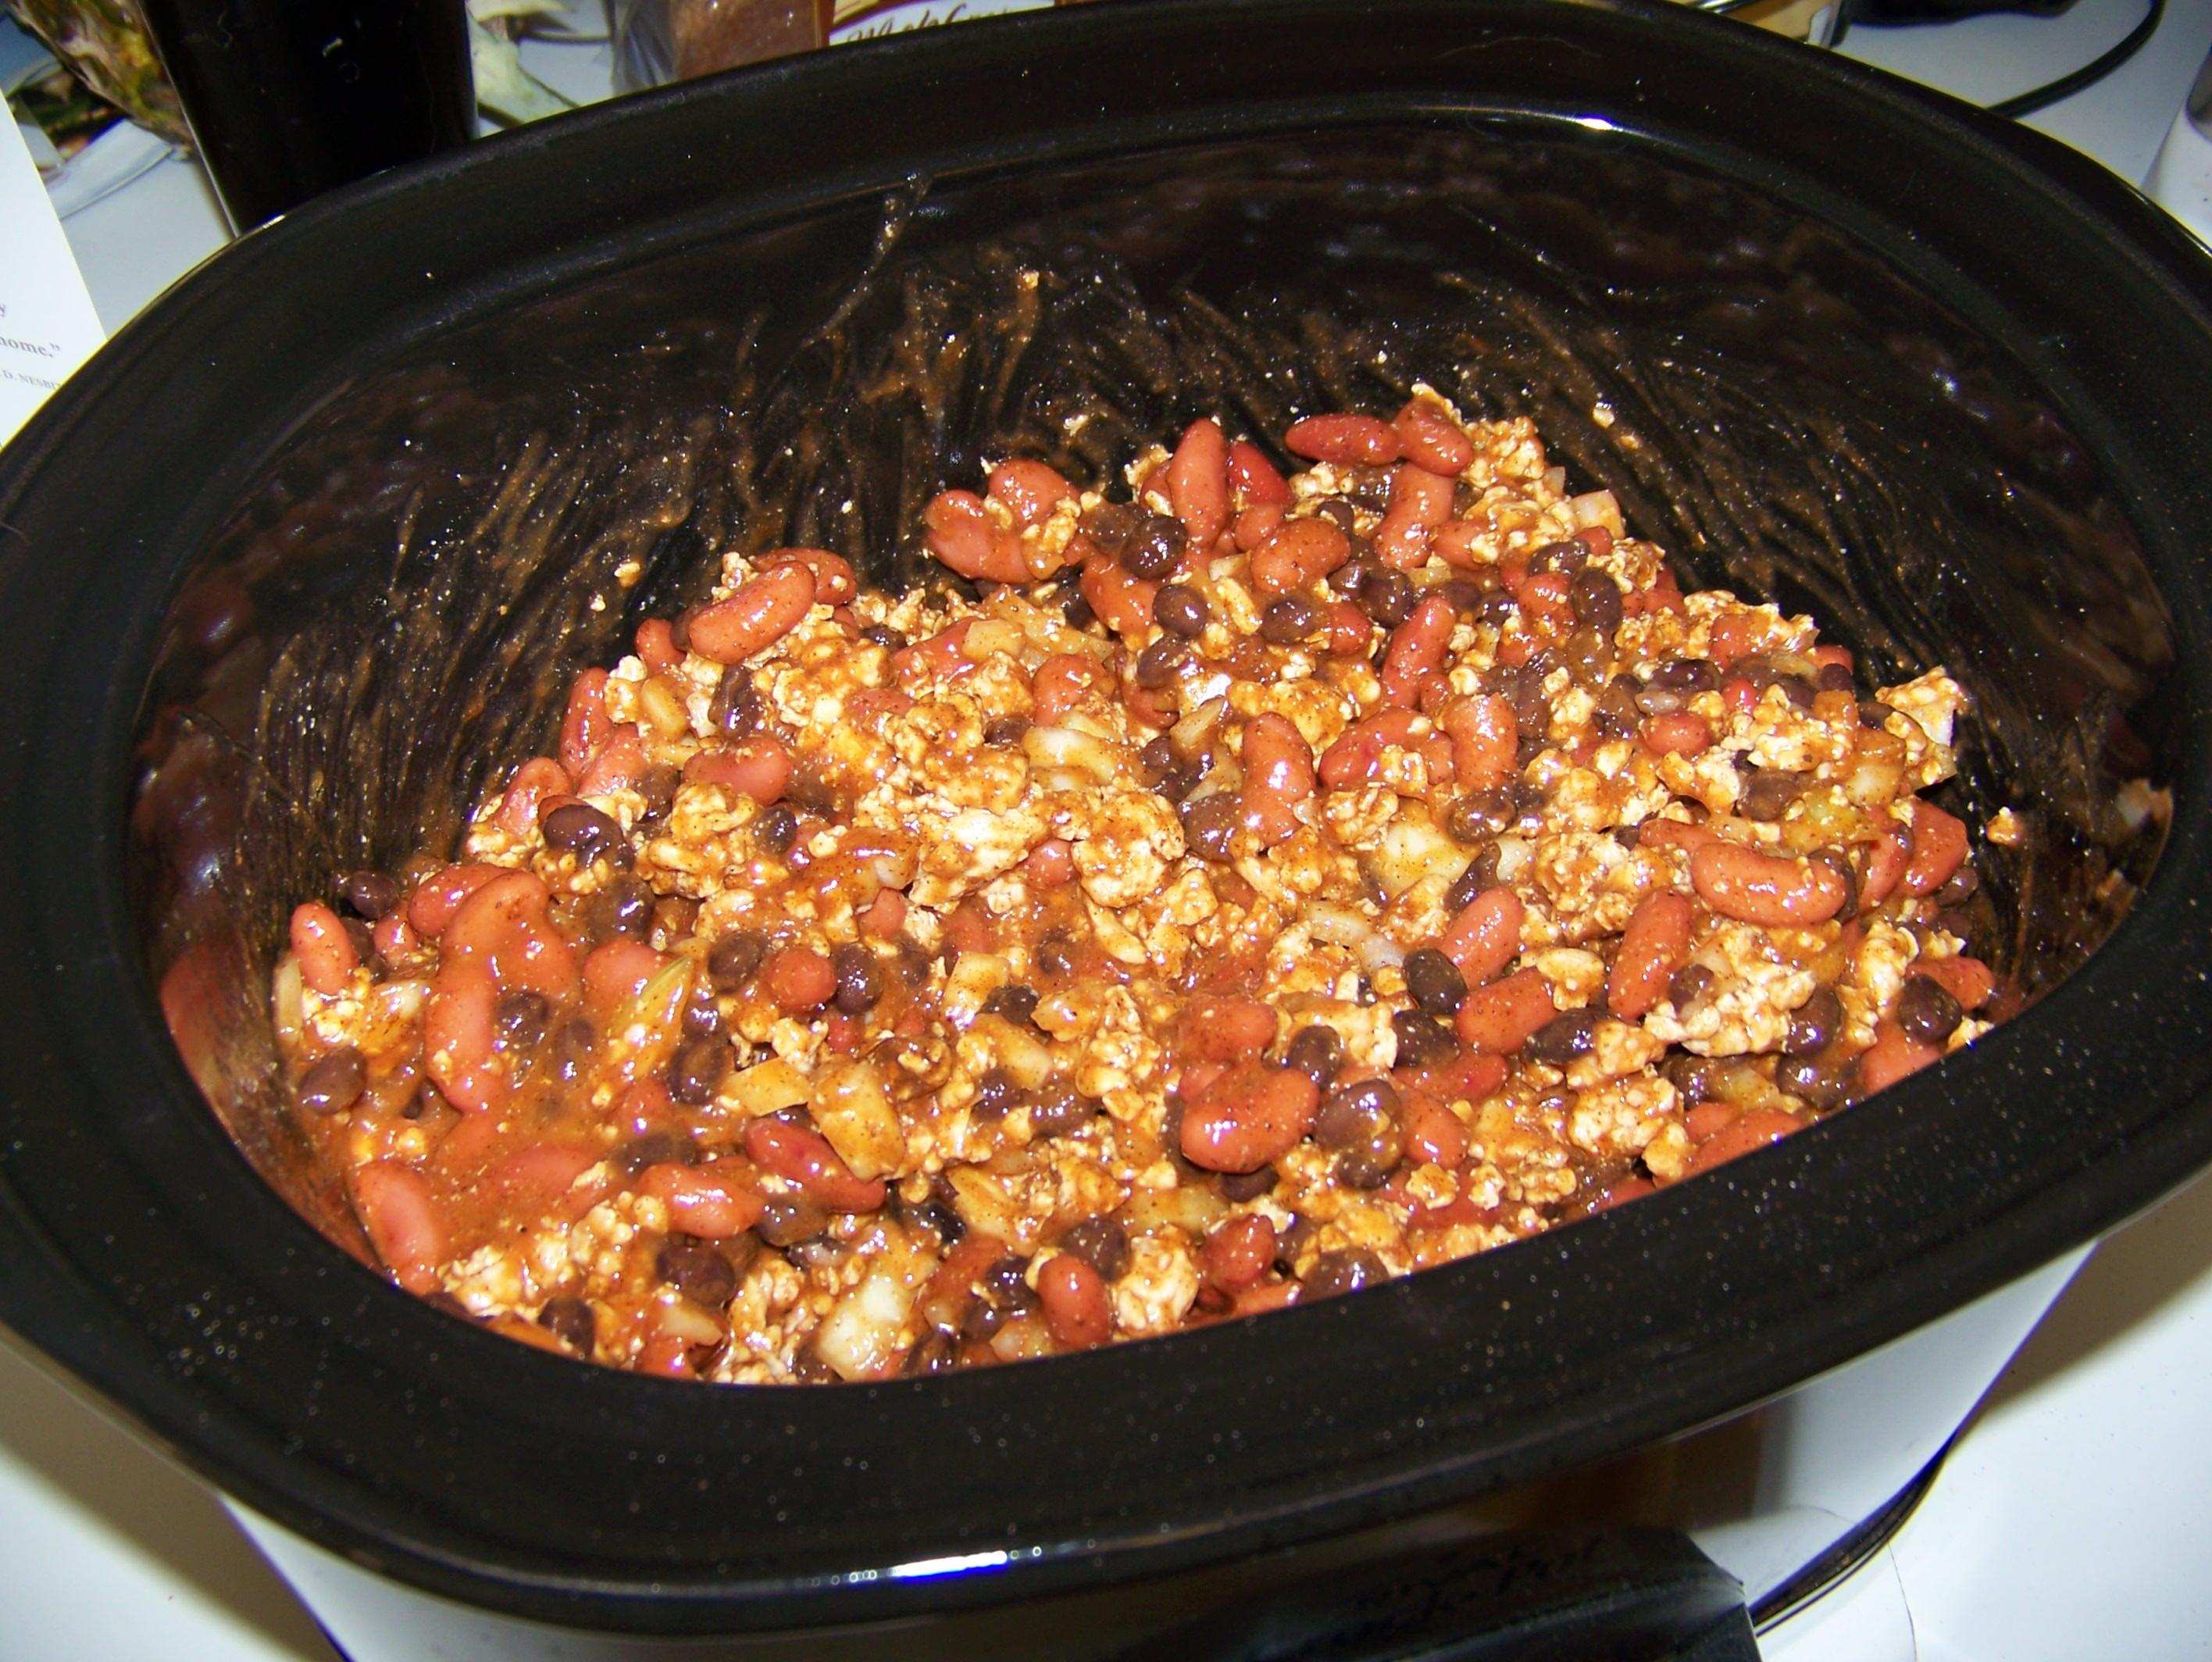 Healthy Ground Turkey Crock Pot Recipes  Crock Pot Recipes Chicken Beef with Ground Beef Easy